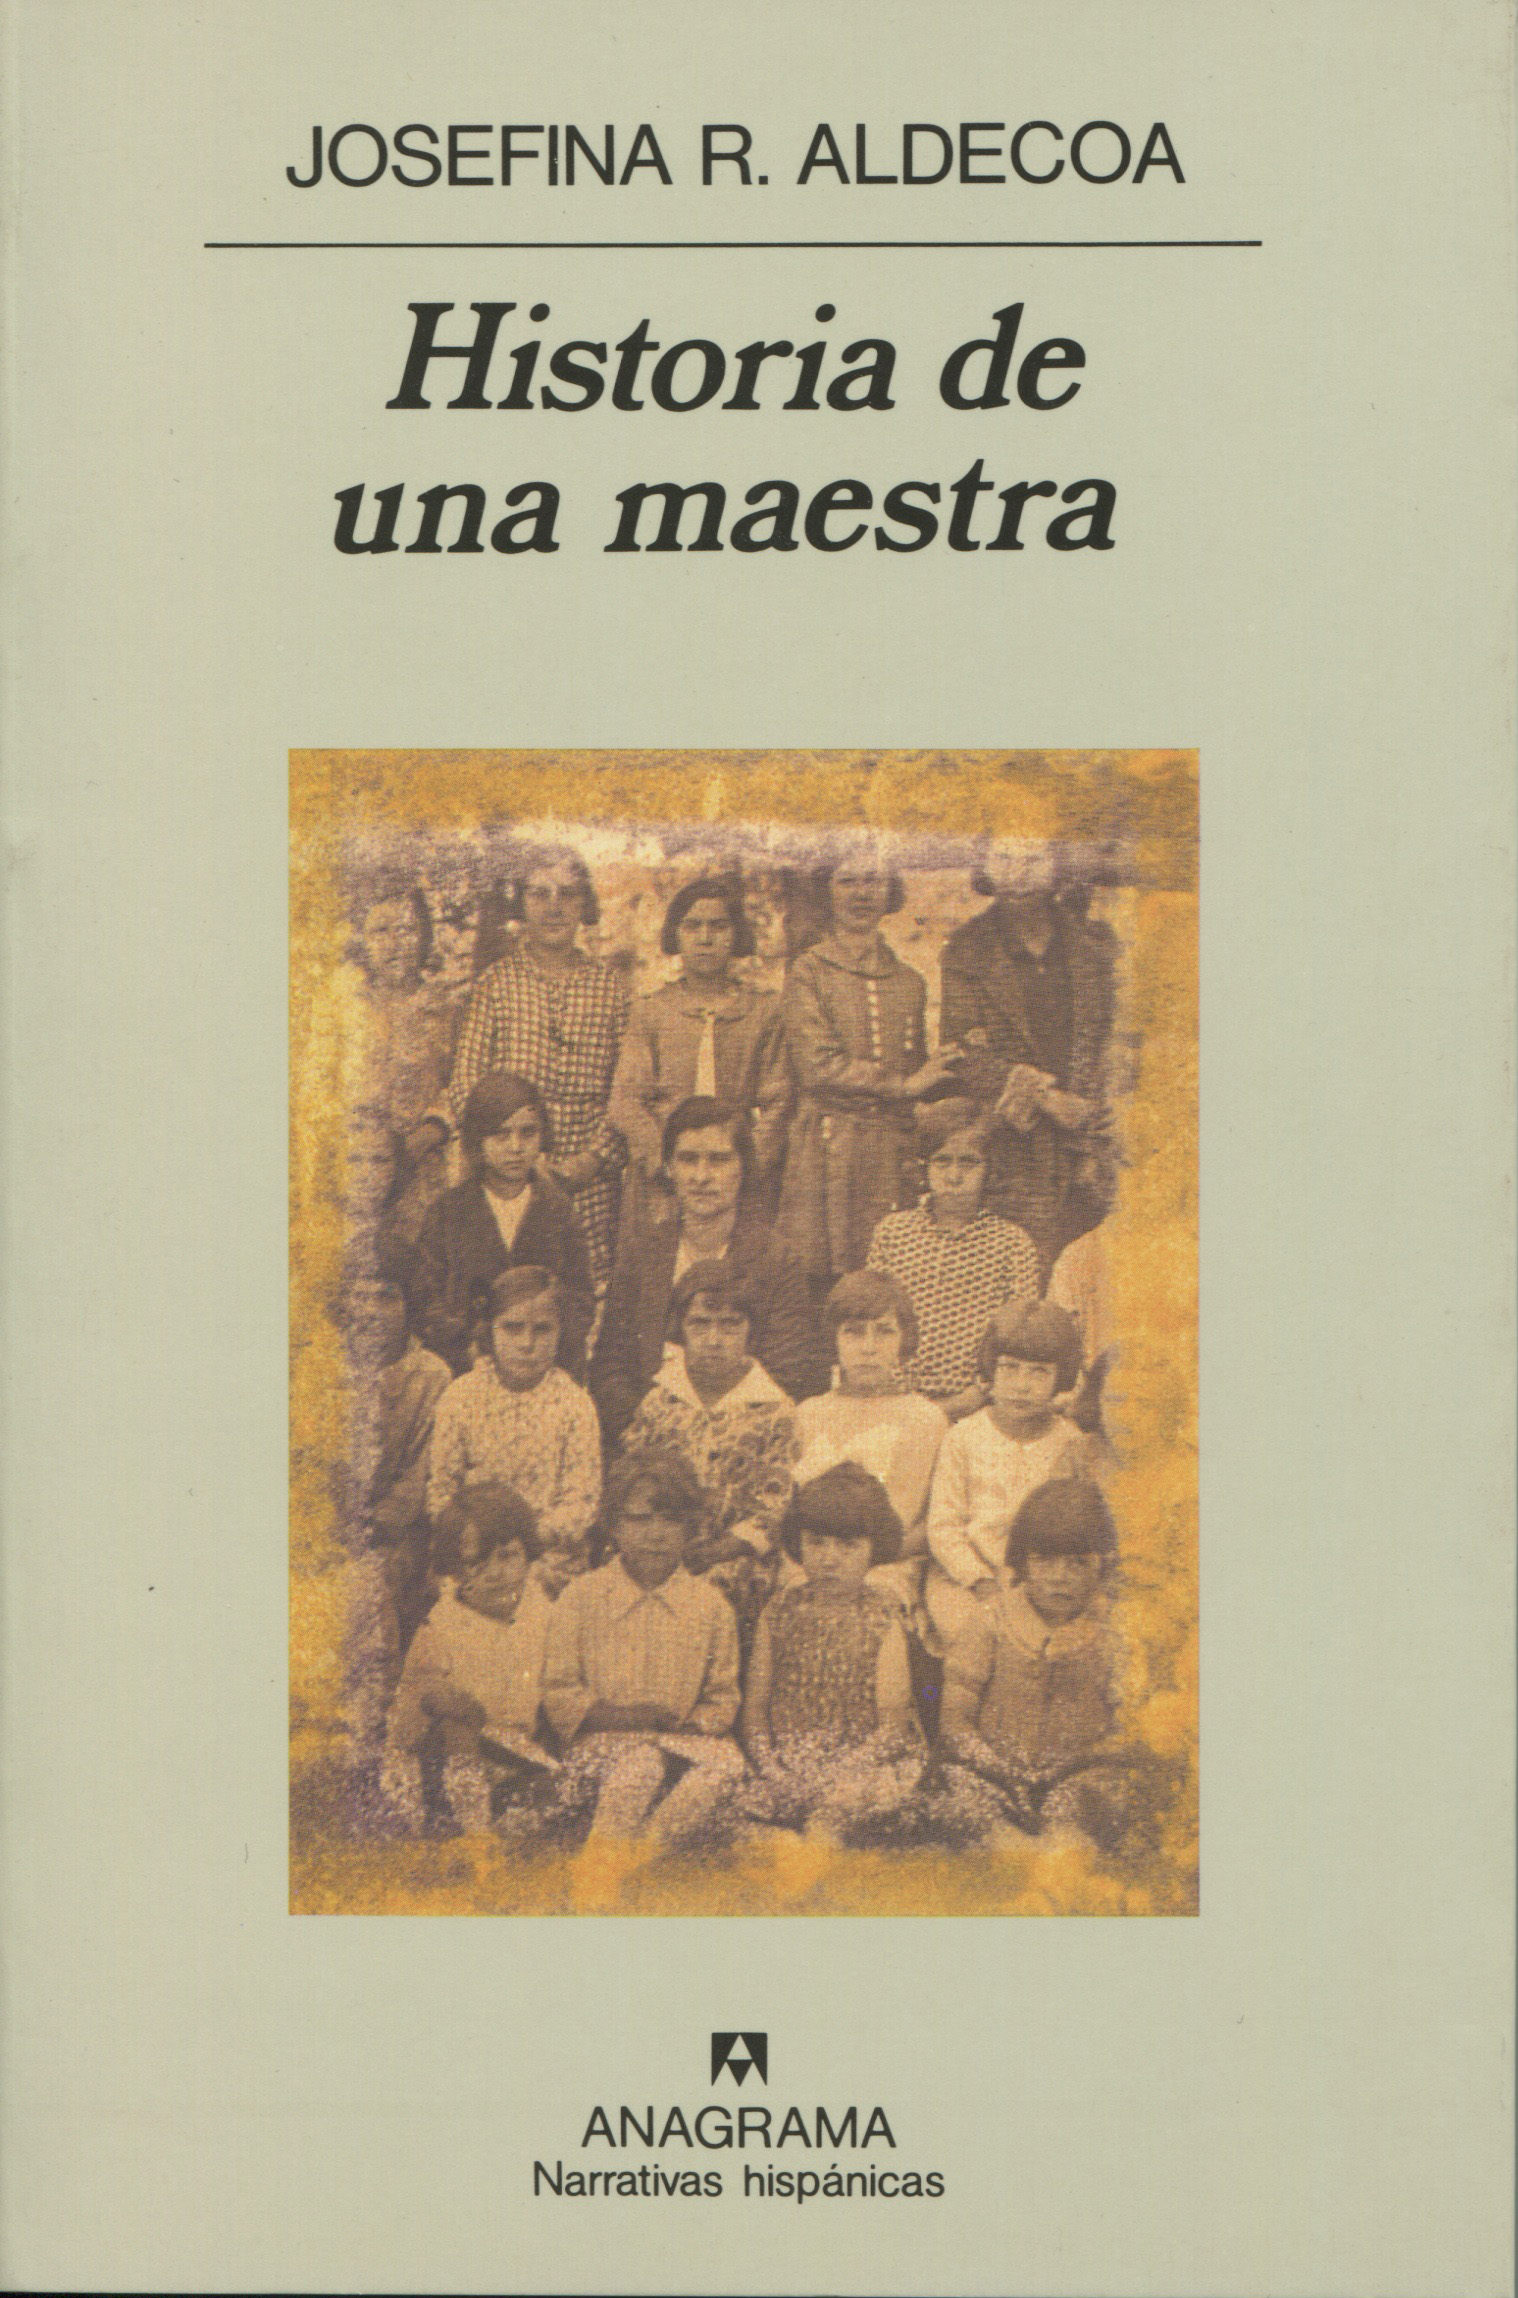 JOSEFINA R. ALDECOA, HISTORIA DE UNA MAESTRA